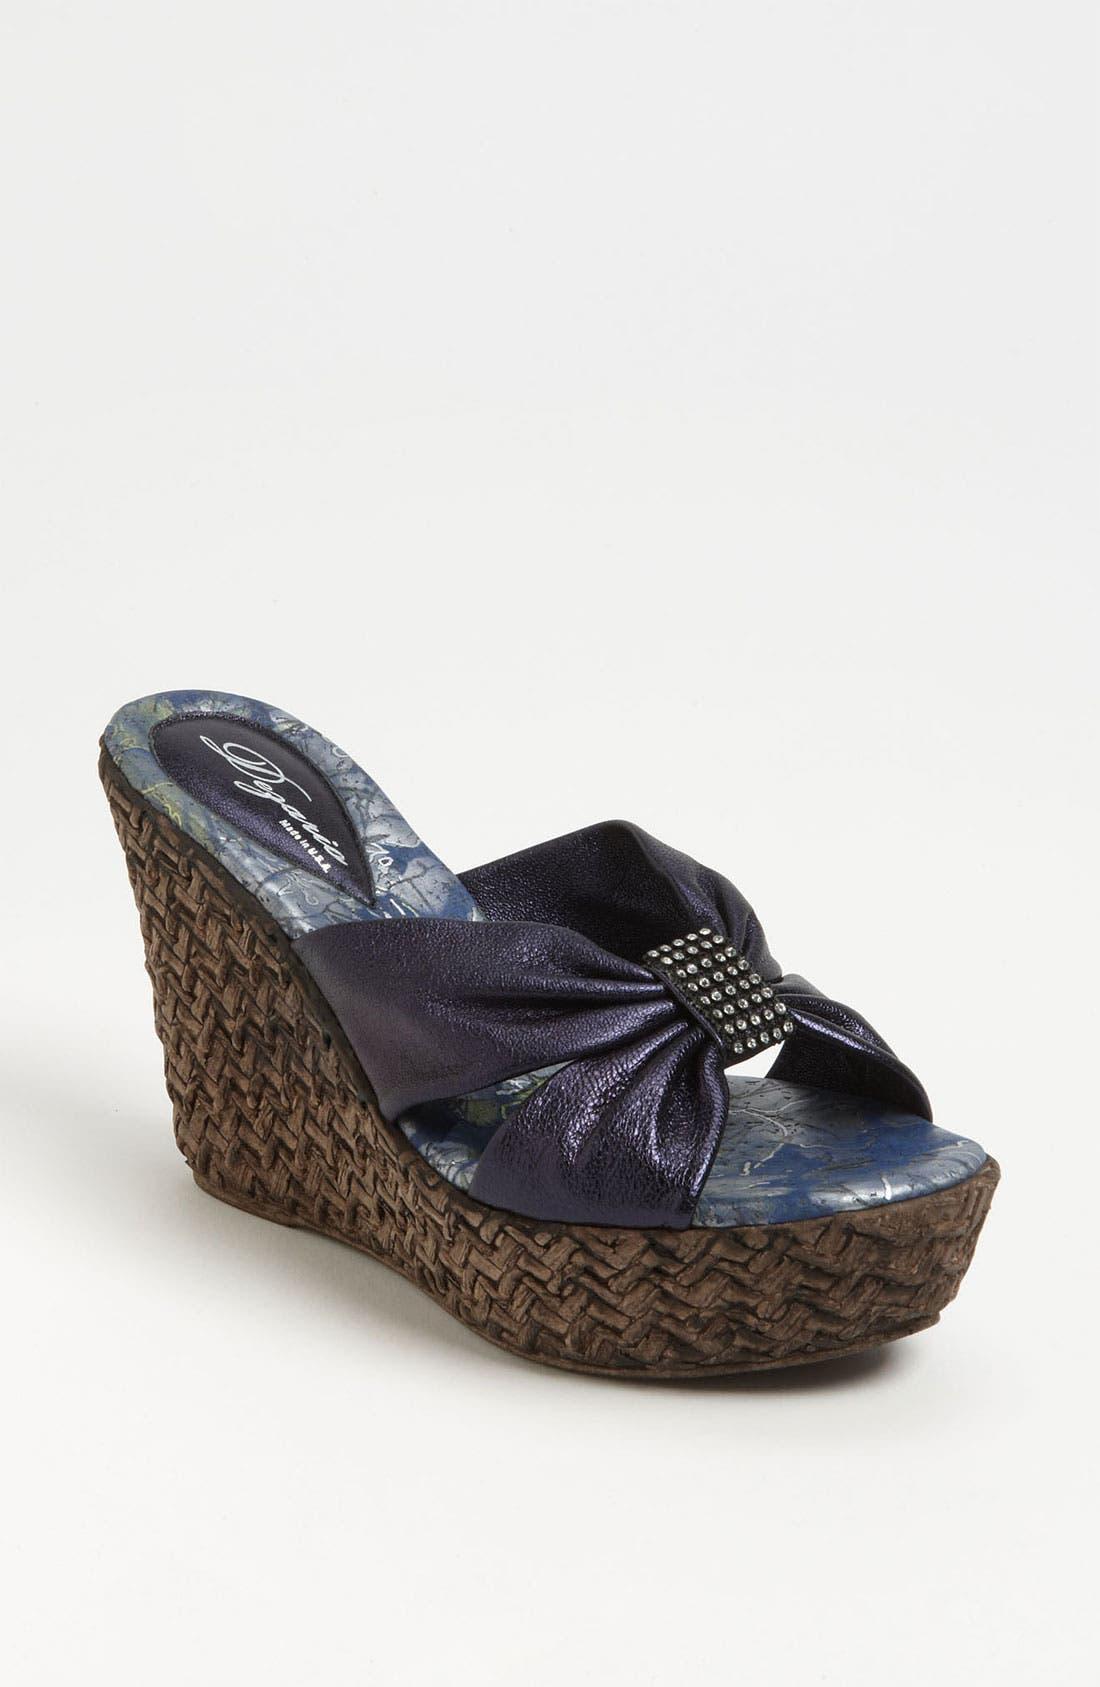 Alternate Image 1 Selected - Dezario 'Tina' Sandal